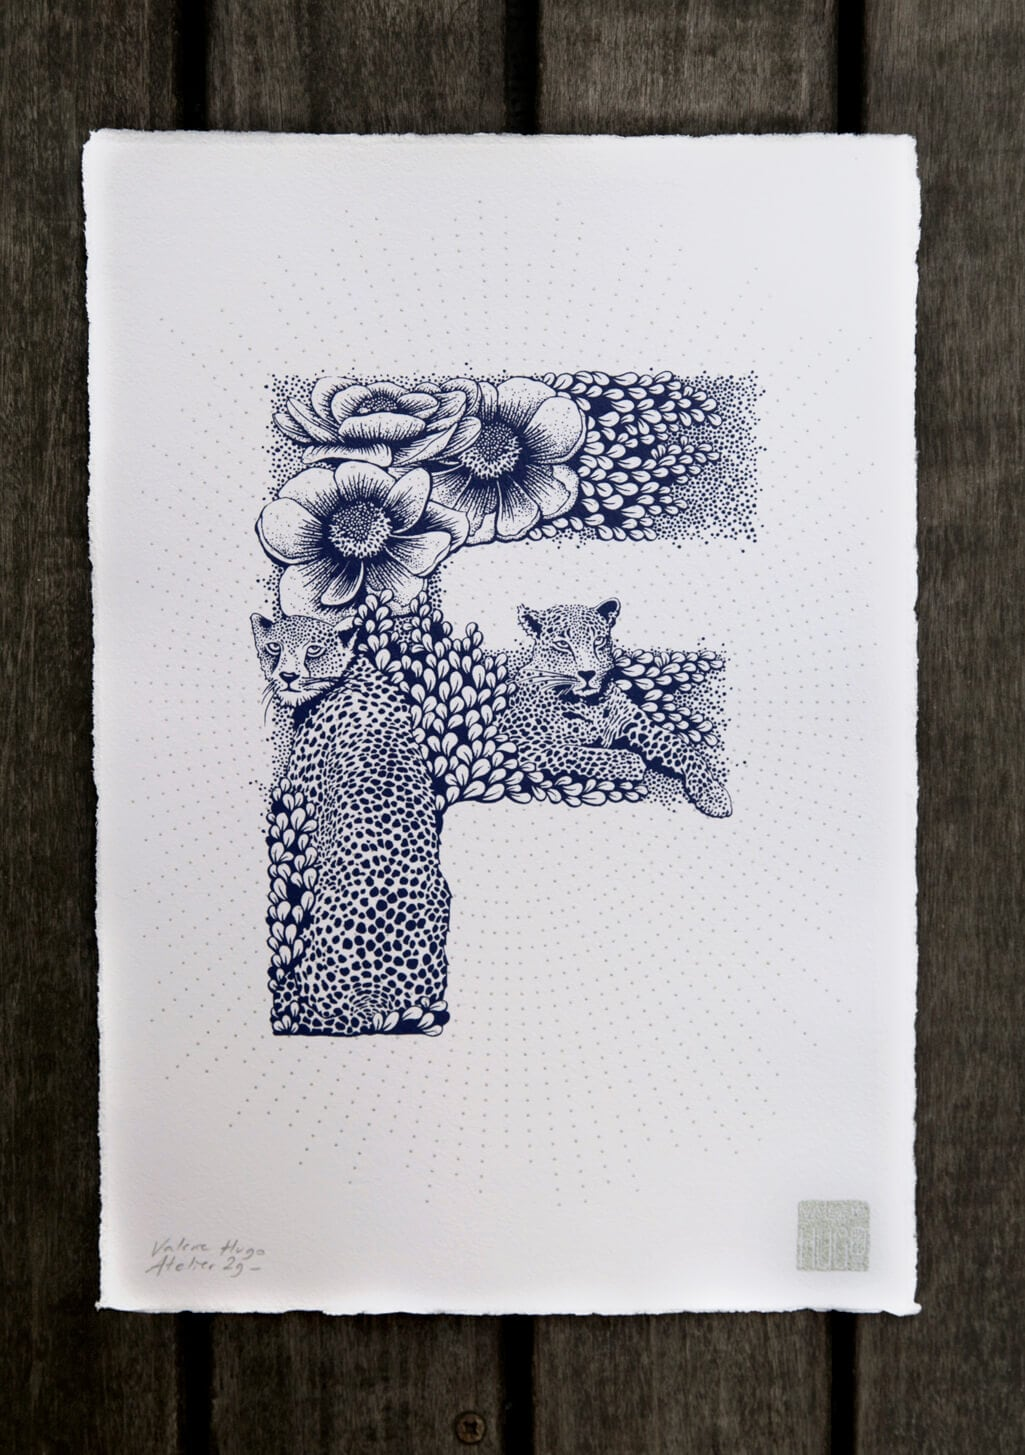 typography-valerie-hugo-fy-6